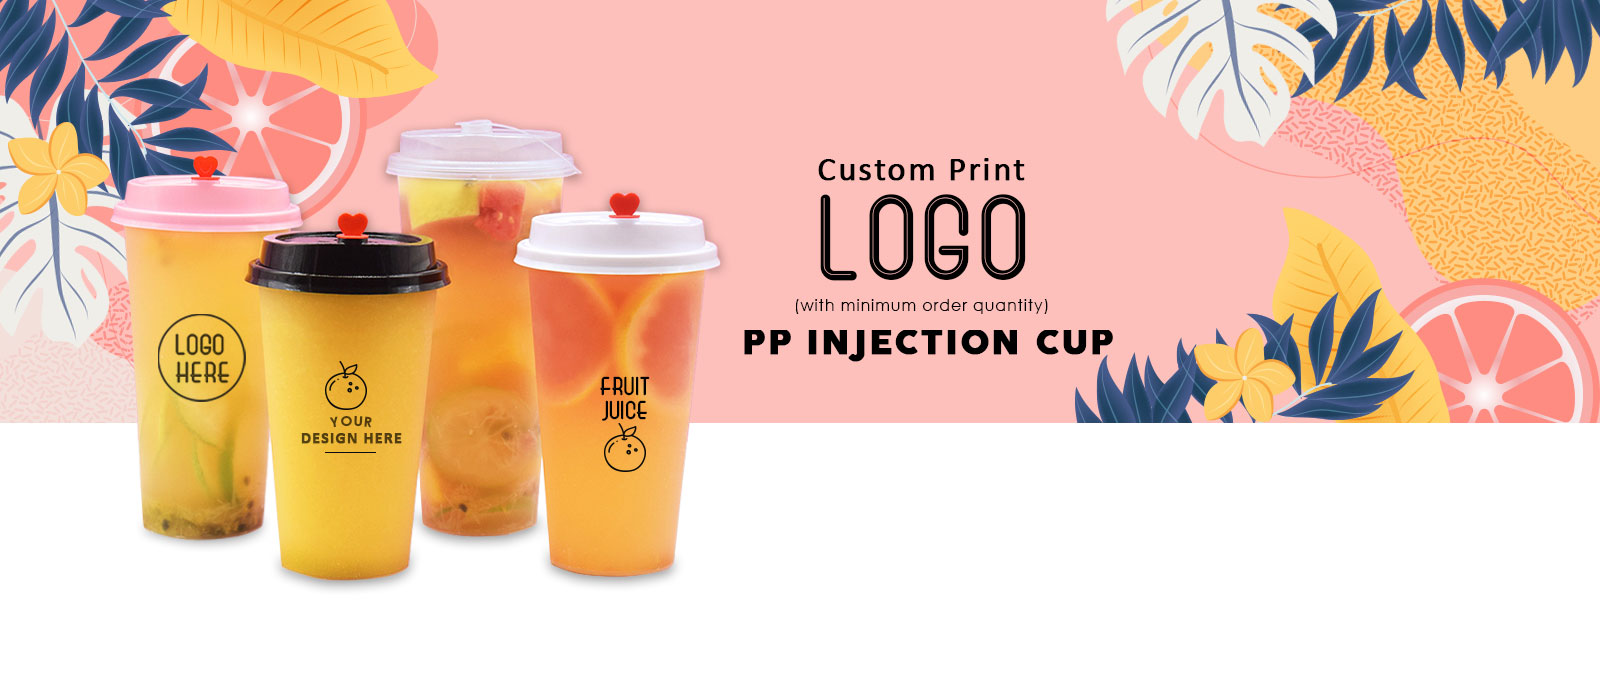 Foodspack-Website-Slider-Custom-Print-Logo